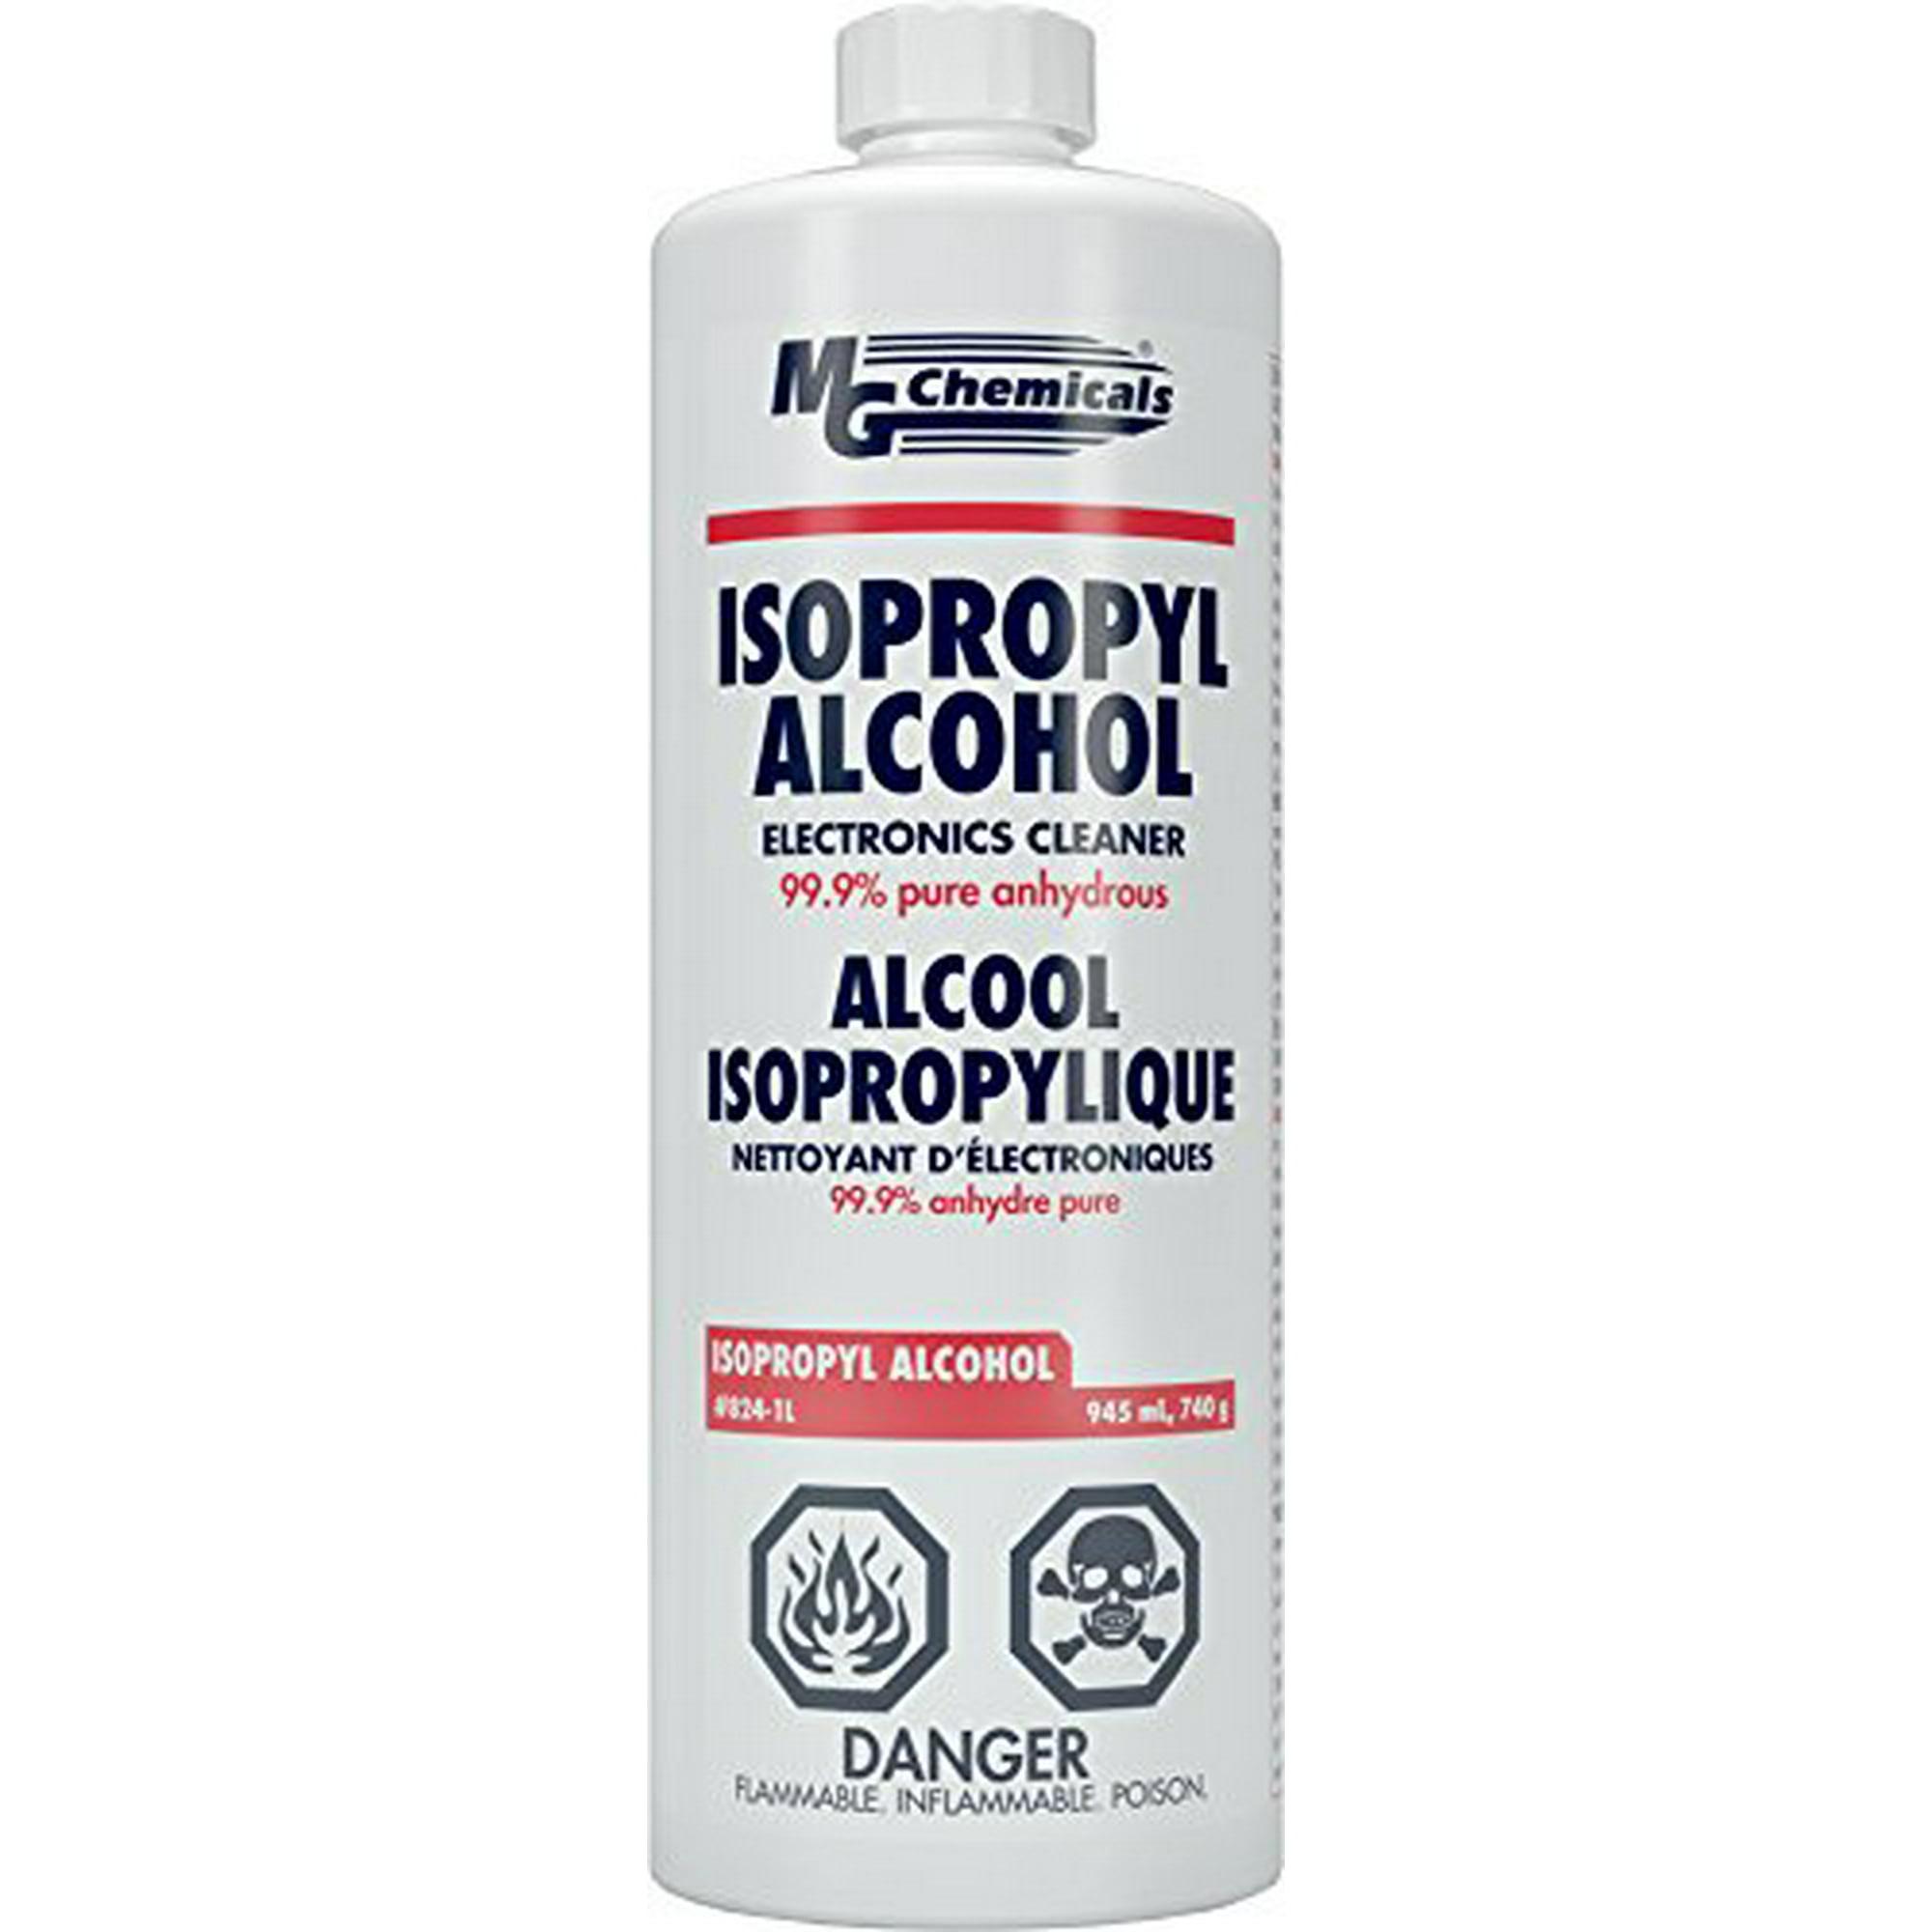 MG Chemicals 824-1L 99 9% Isopropyl Alcohol Liquid Cleaner, Clear , 945 mL  (1 US Quart)